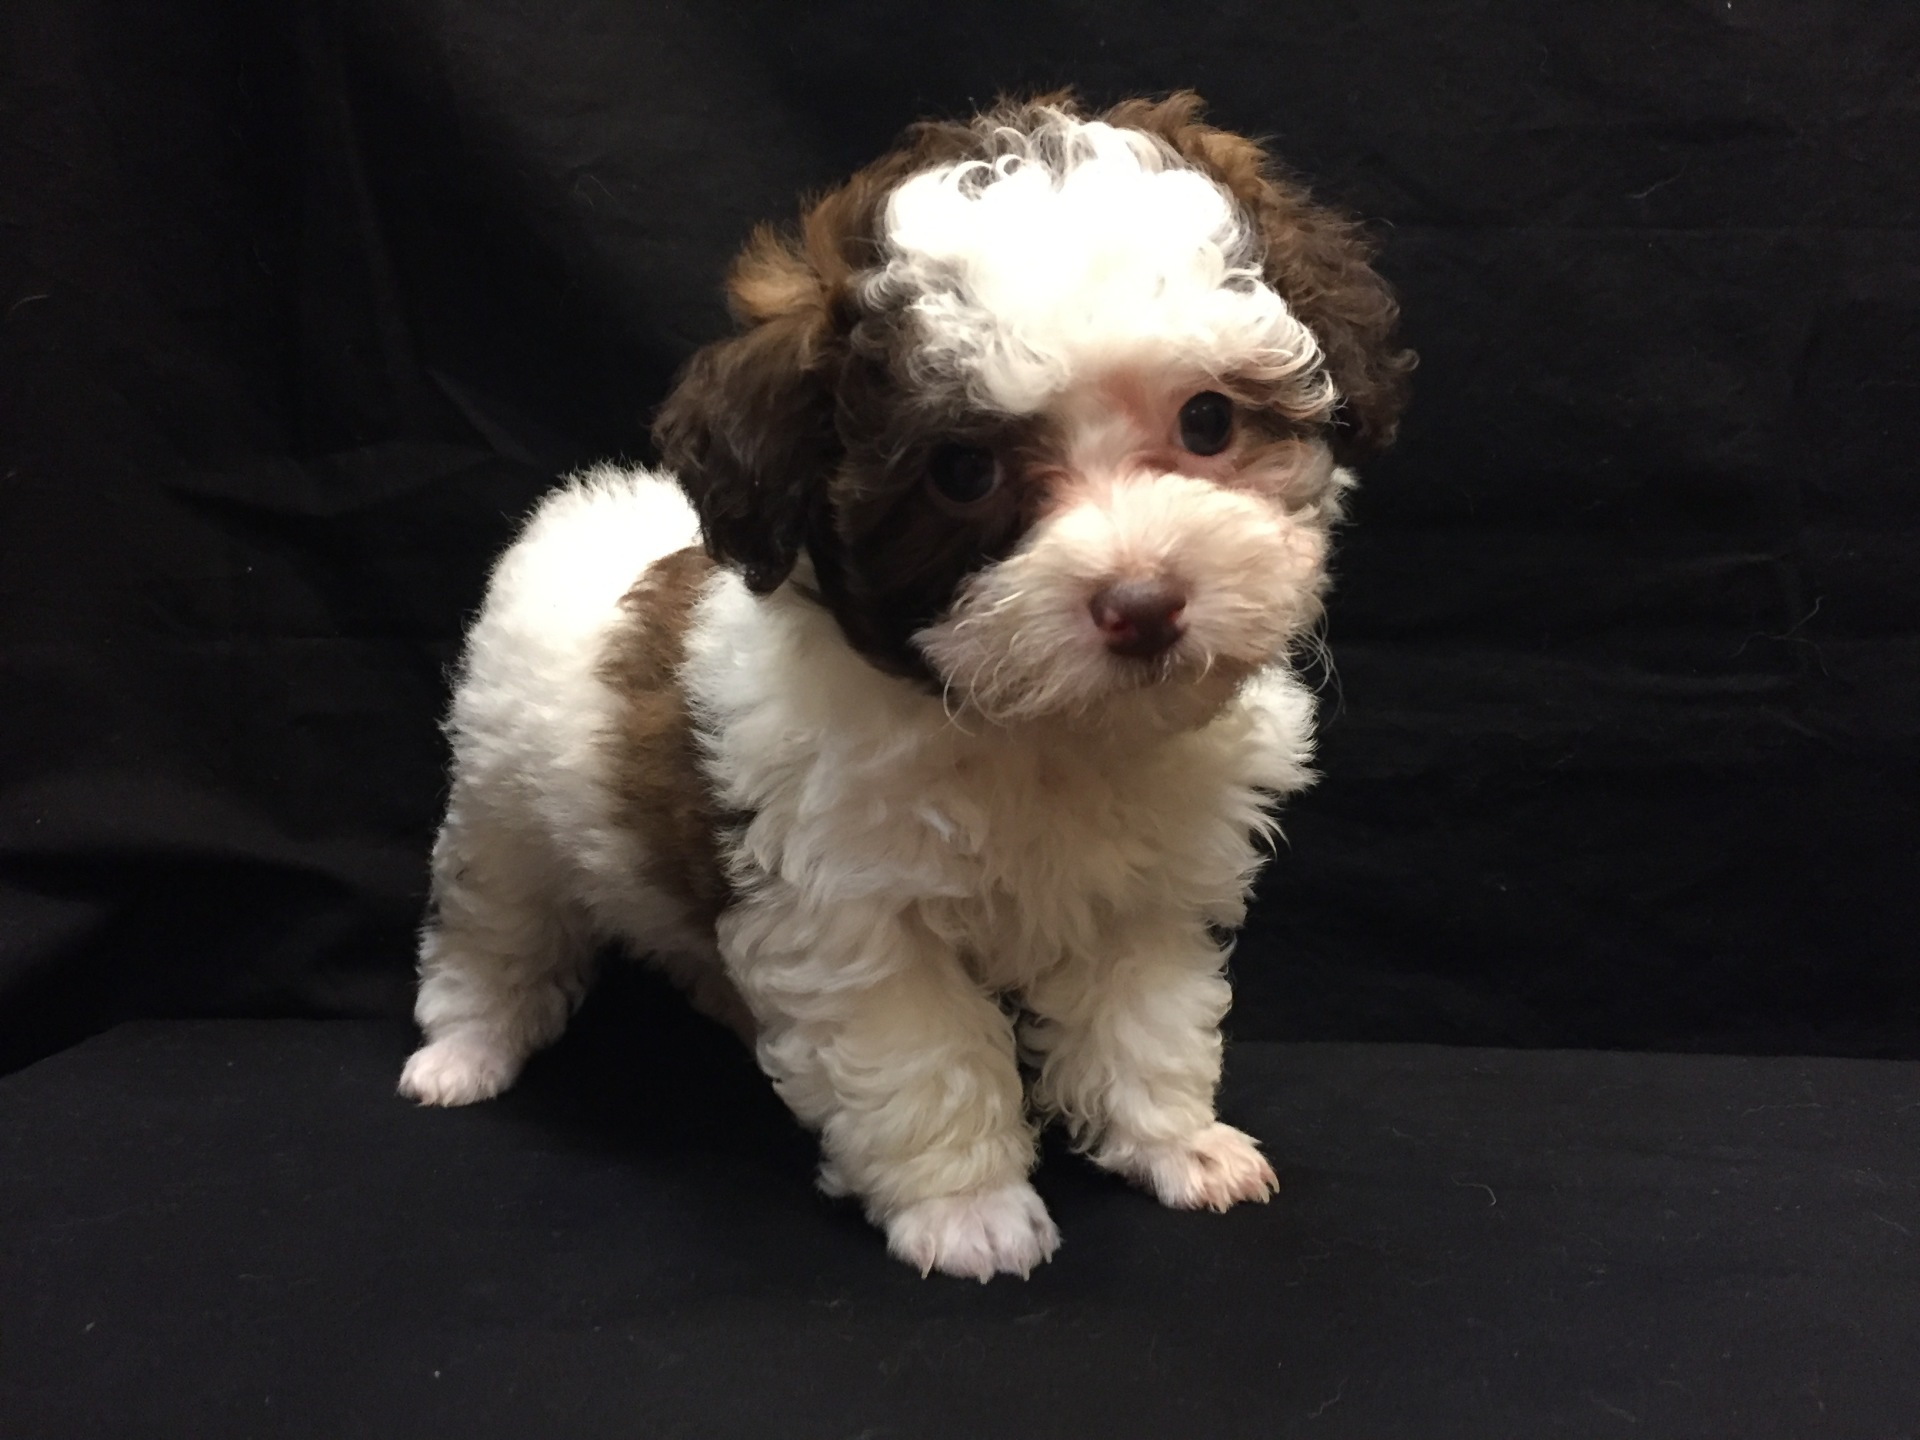 #4070 - Male Malti-Poo (Maltese - Poodle)